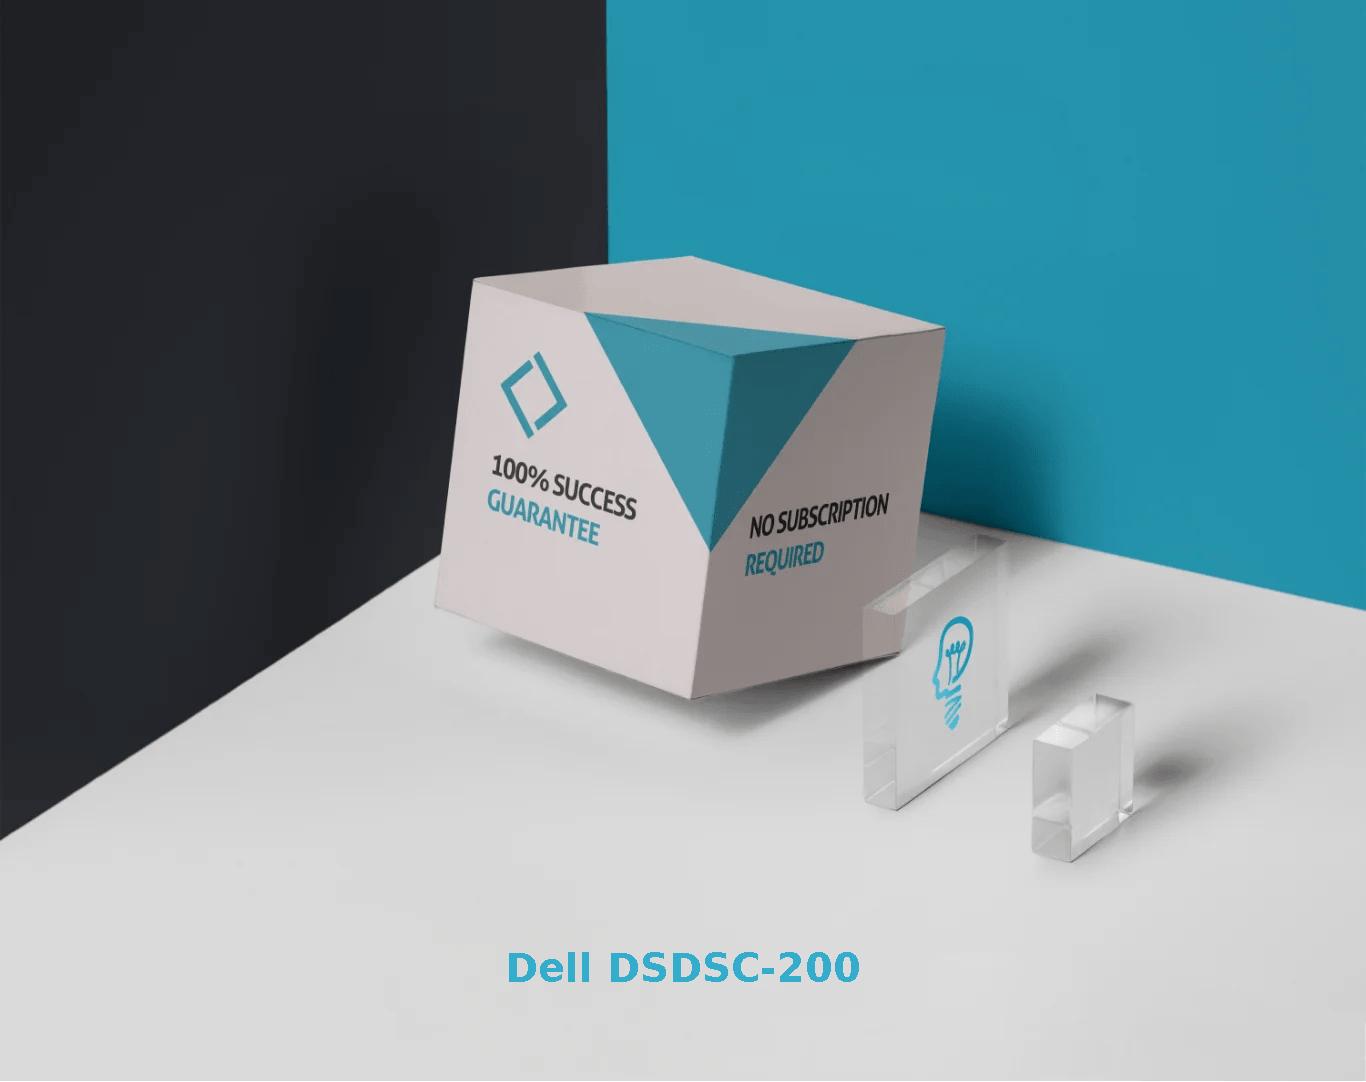 DSDSC-200 Dumps